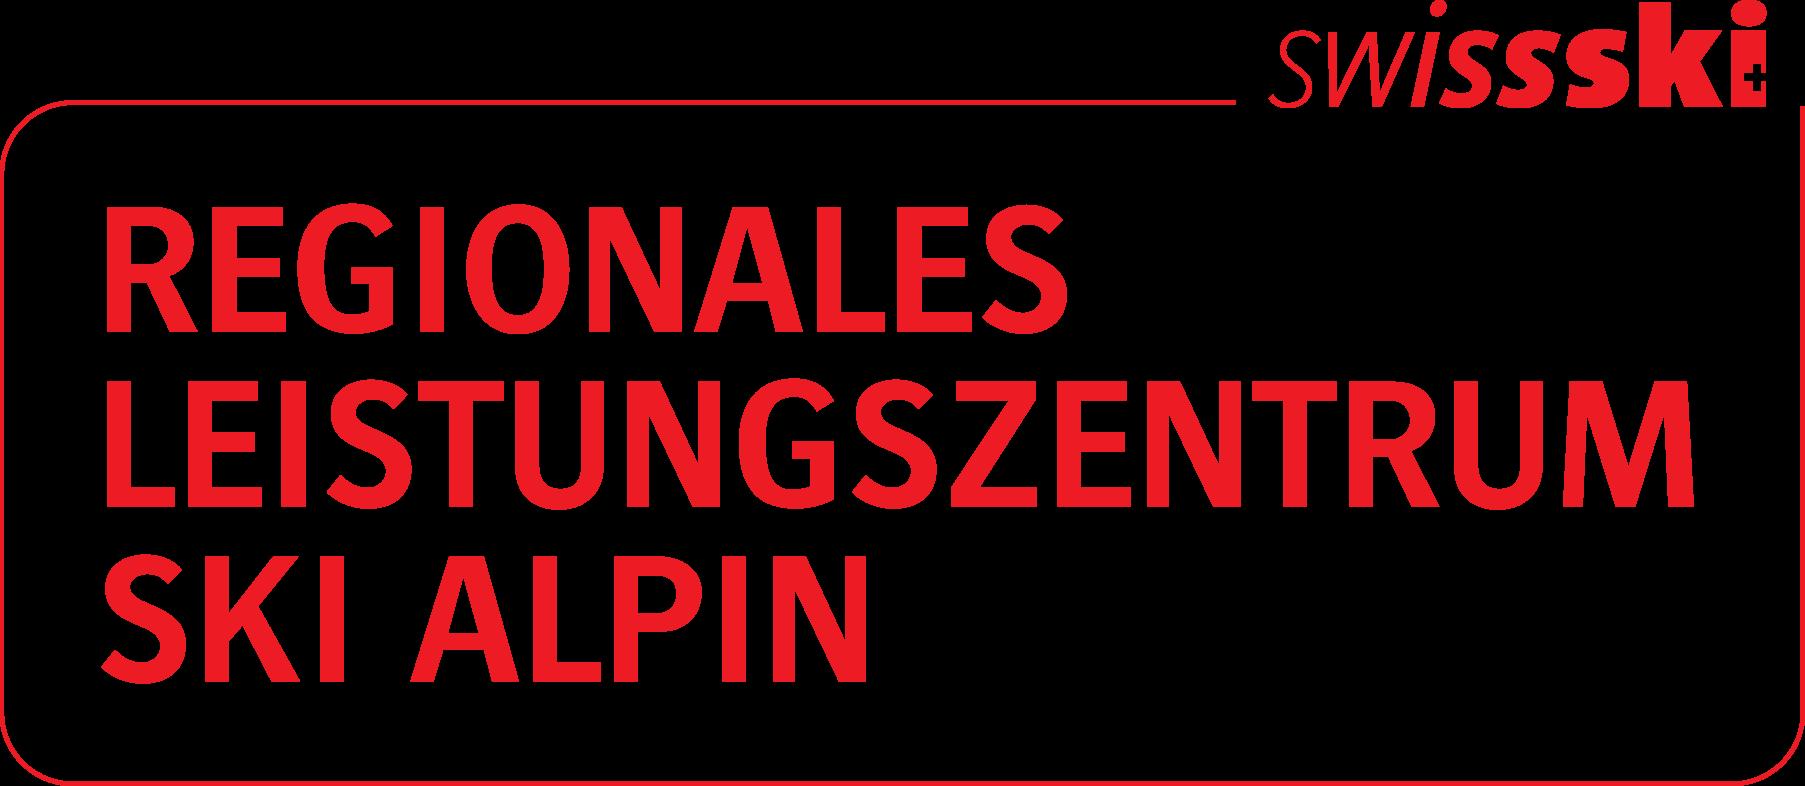 SwissSki_RLZ_Label